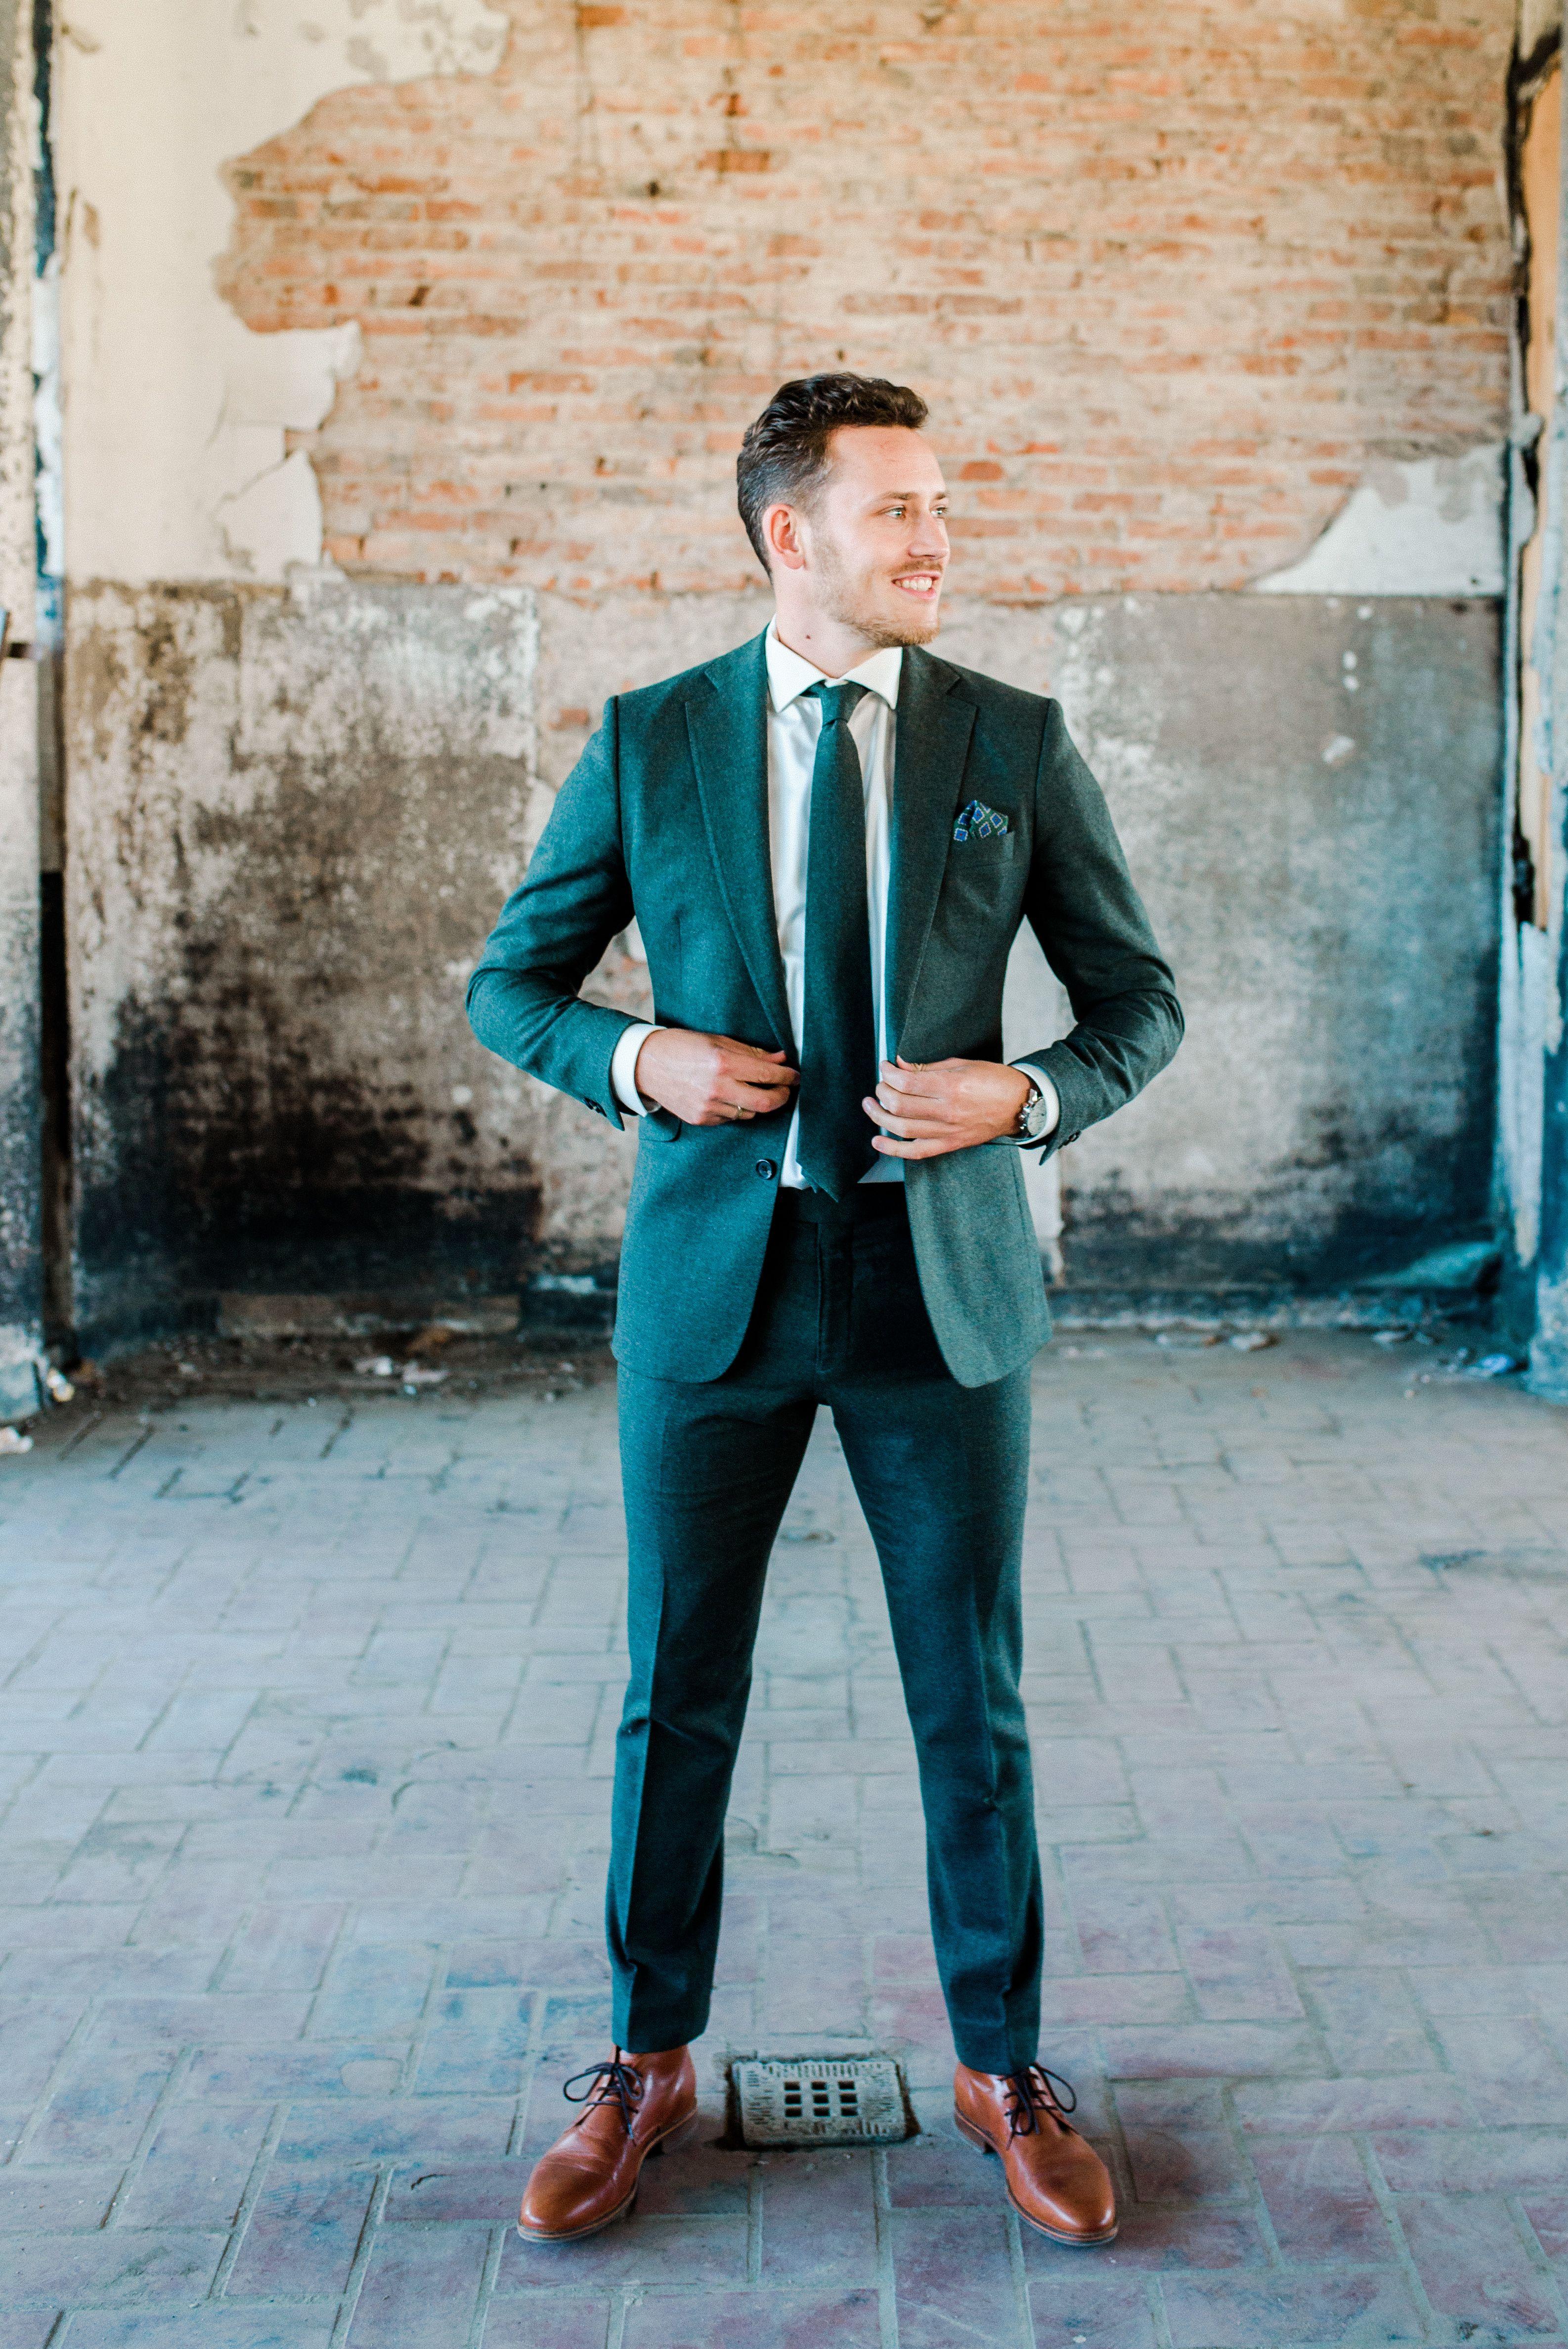 WEDDING SUIT: Green is the wedding trend this season. | wedding ...